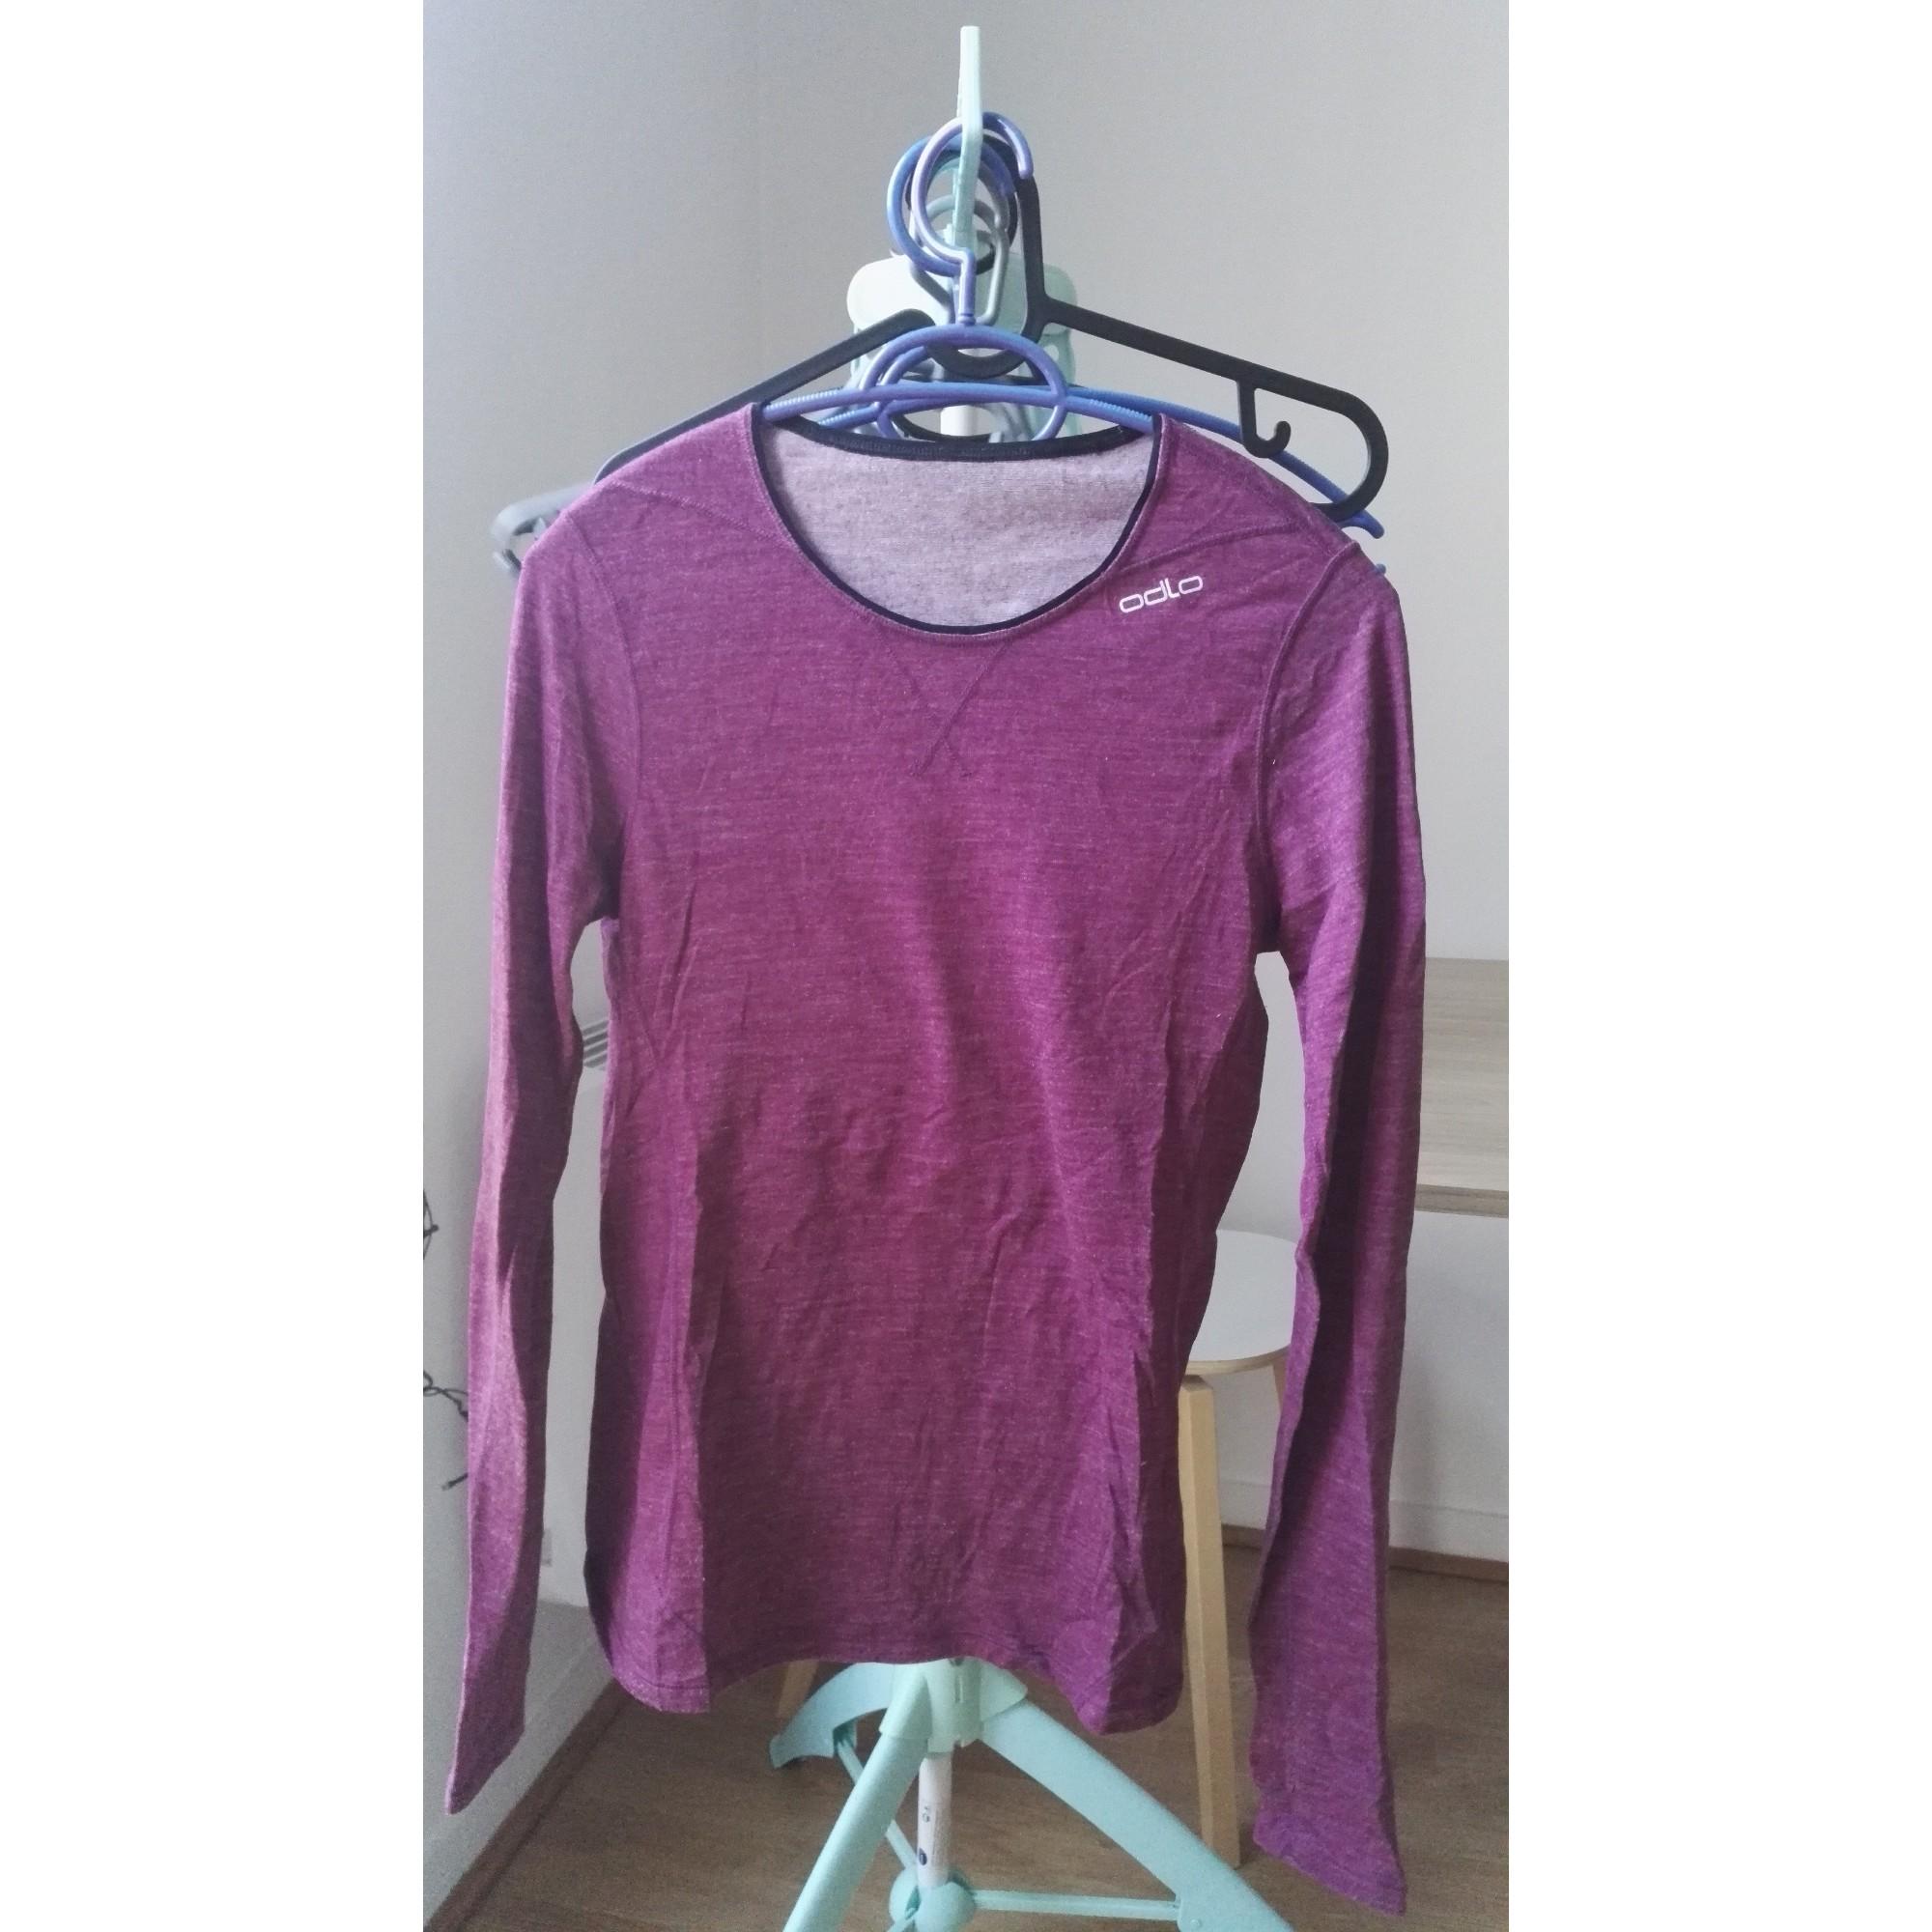 Top, tee-shirt ODLO Violet, mauve, lavande